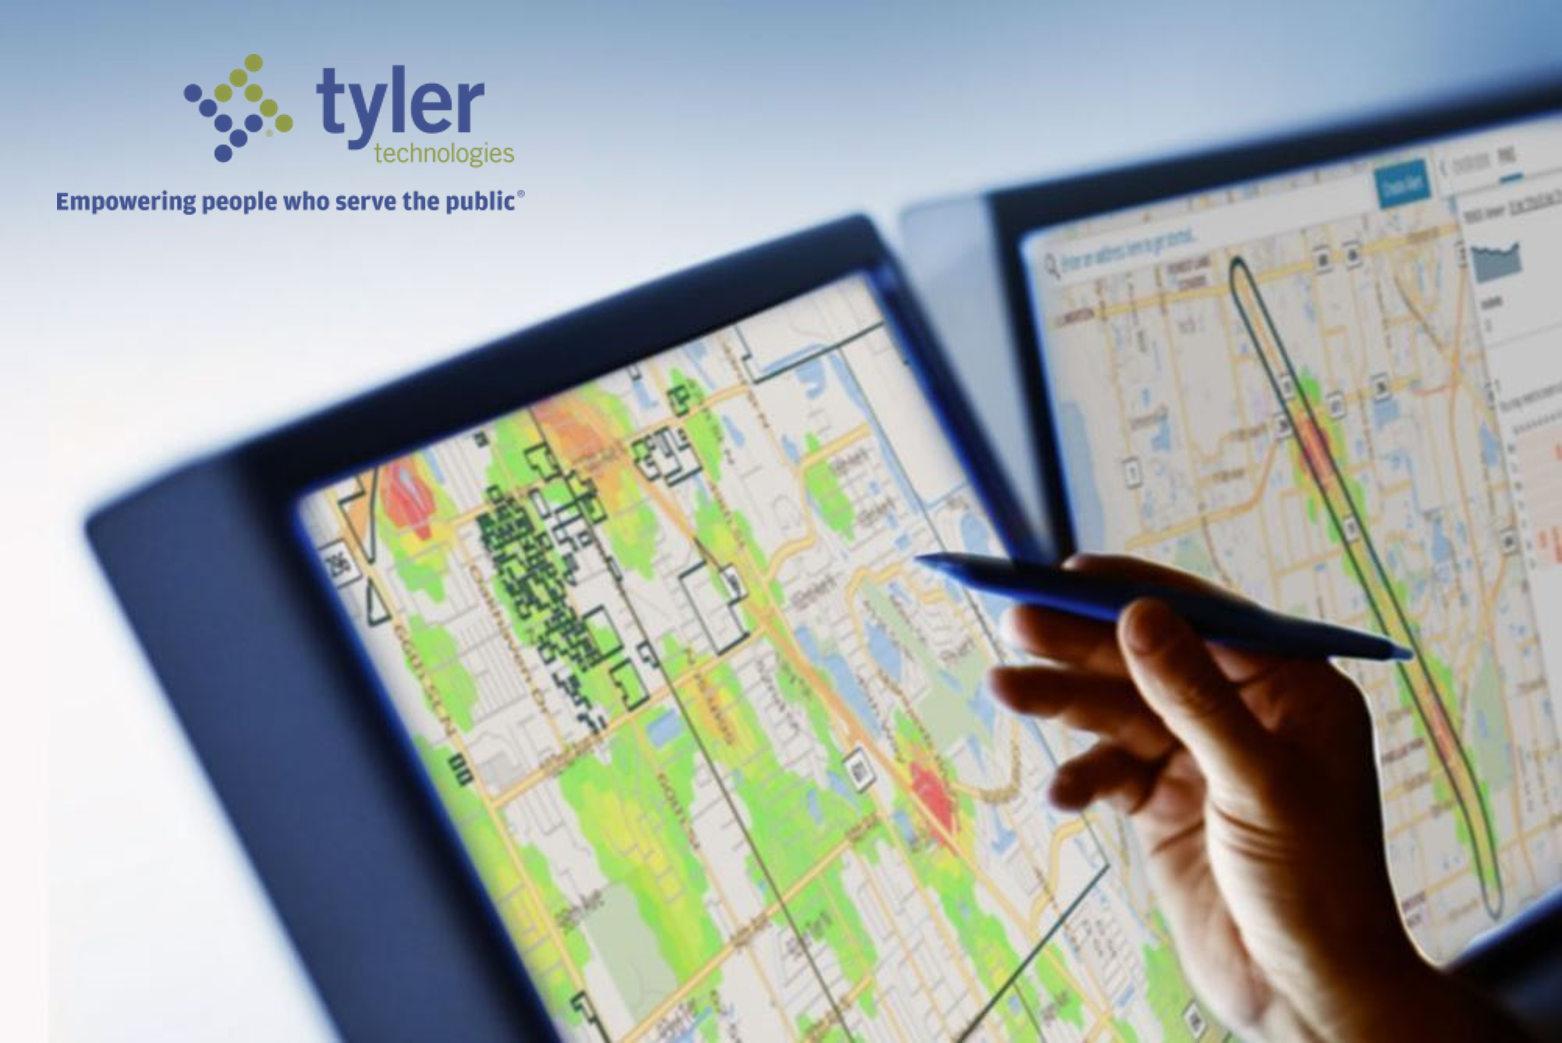 tyler technologies public